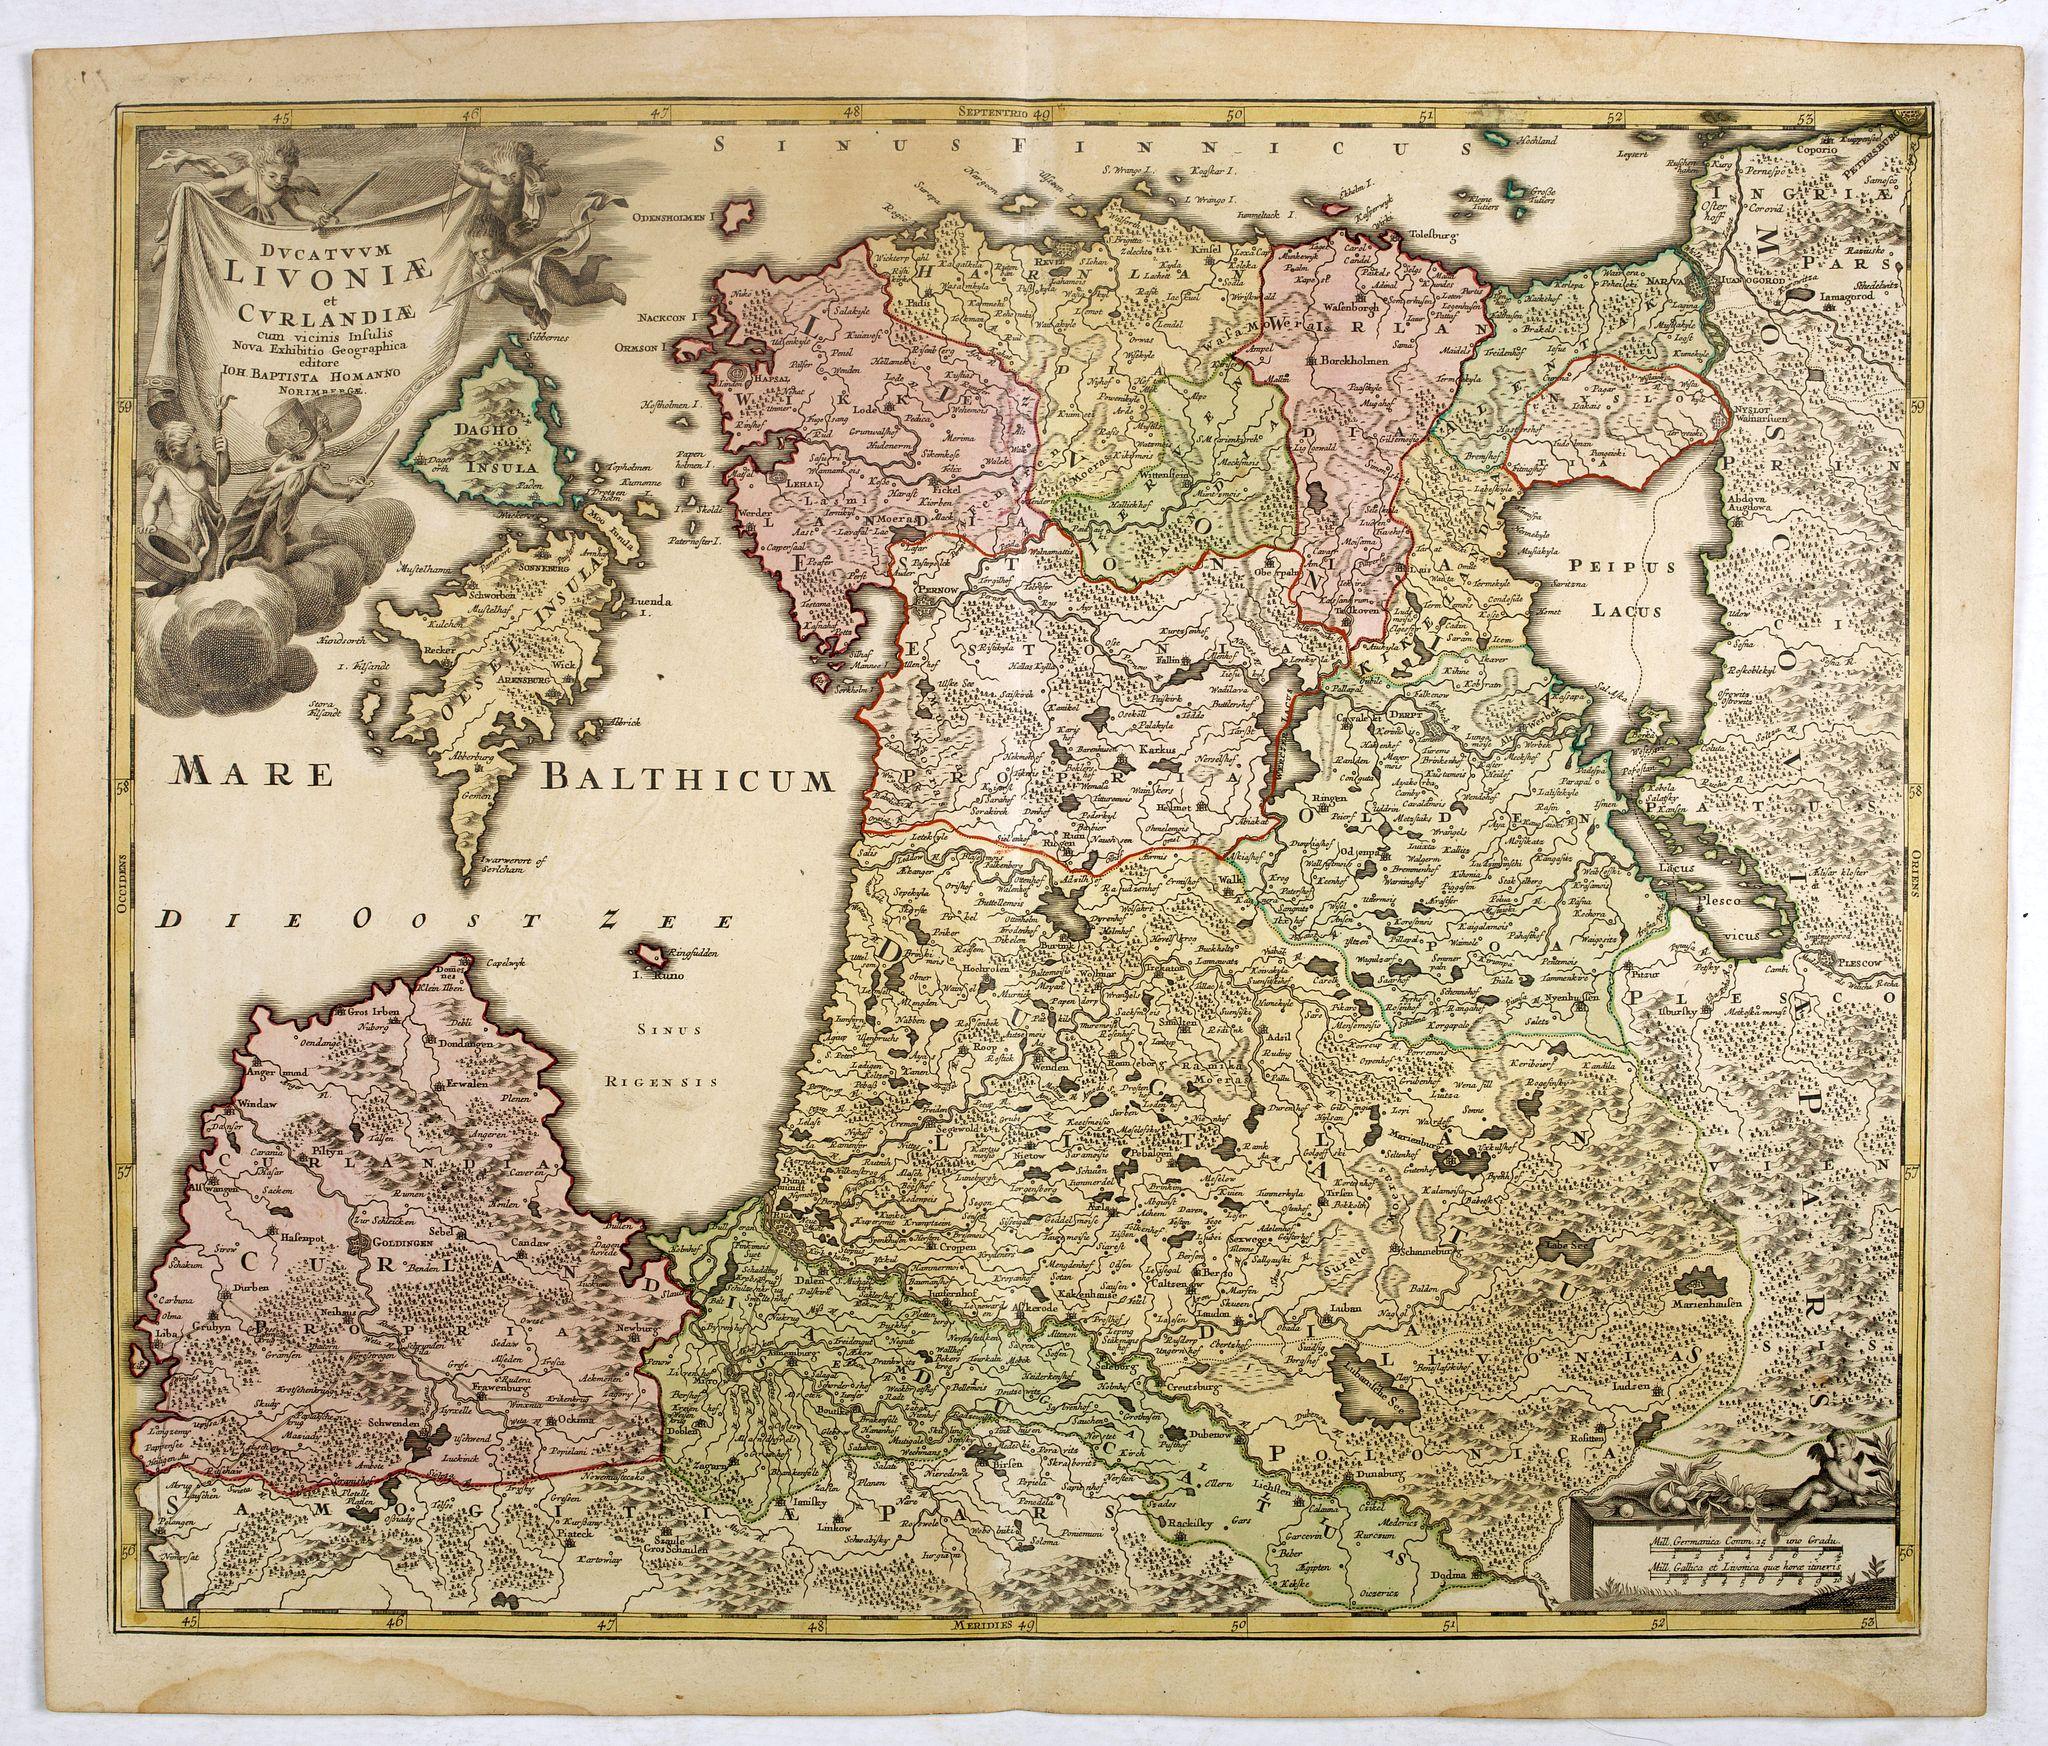 HOMANN, J.B. -  Dvcatvvm Livoniae et Cvrlandiae cum vicinis insulis nova exhibitio geographica.